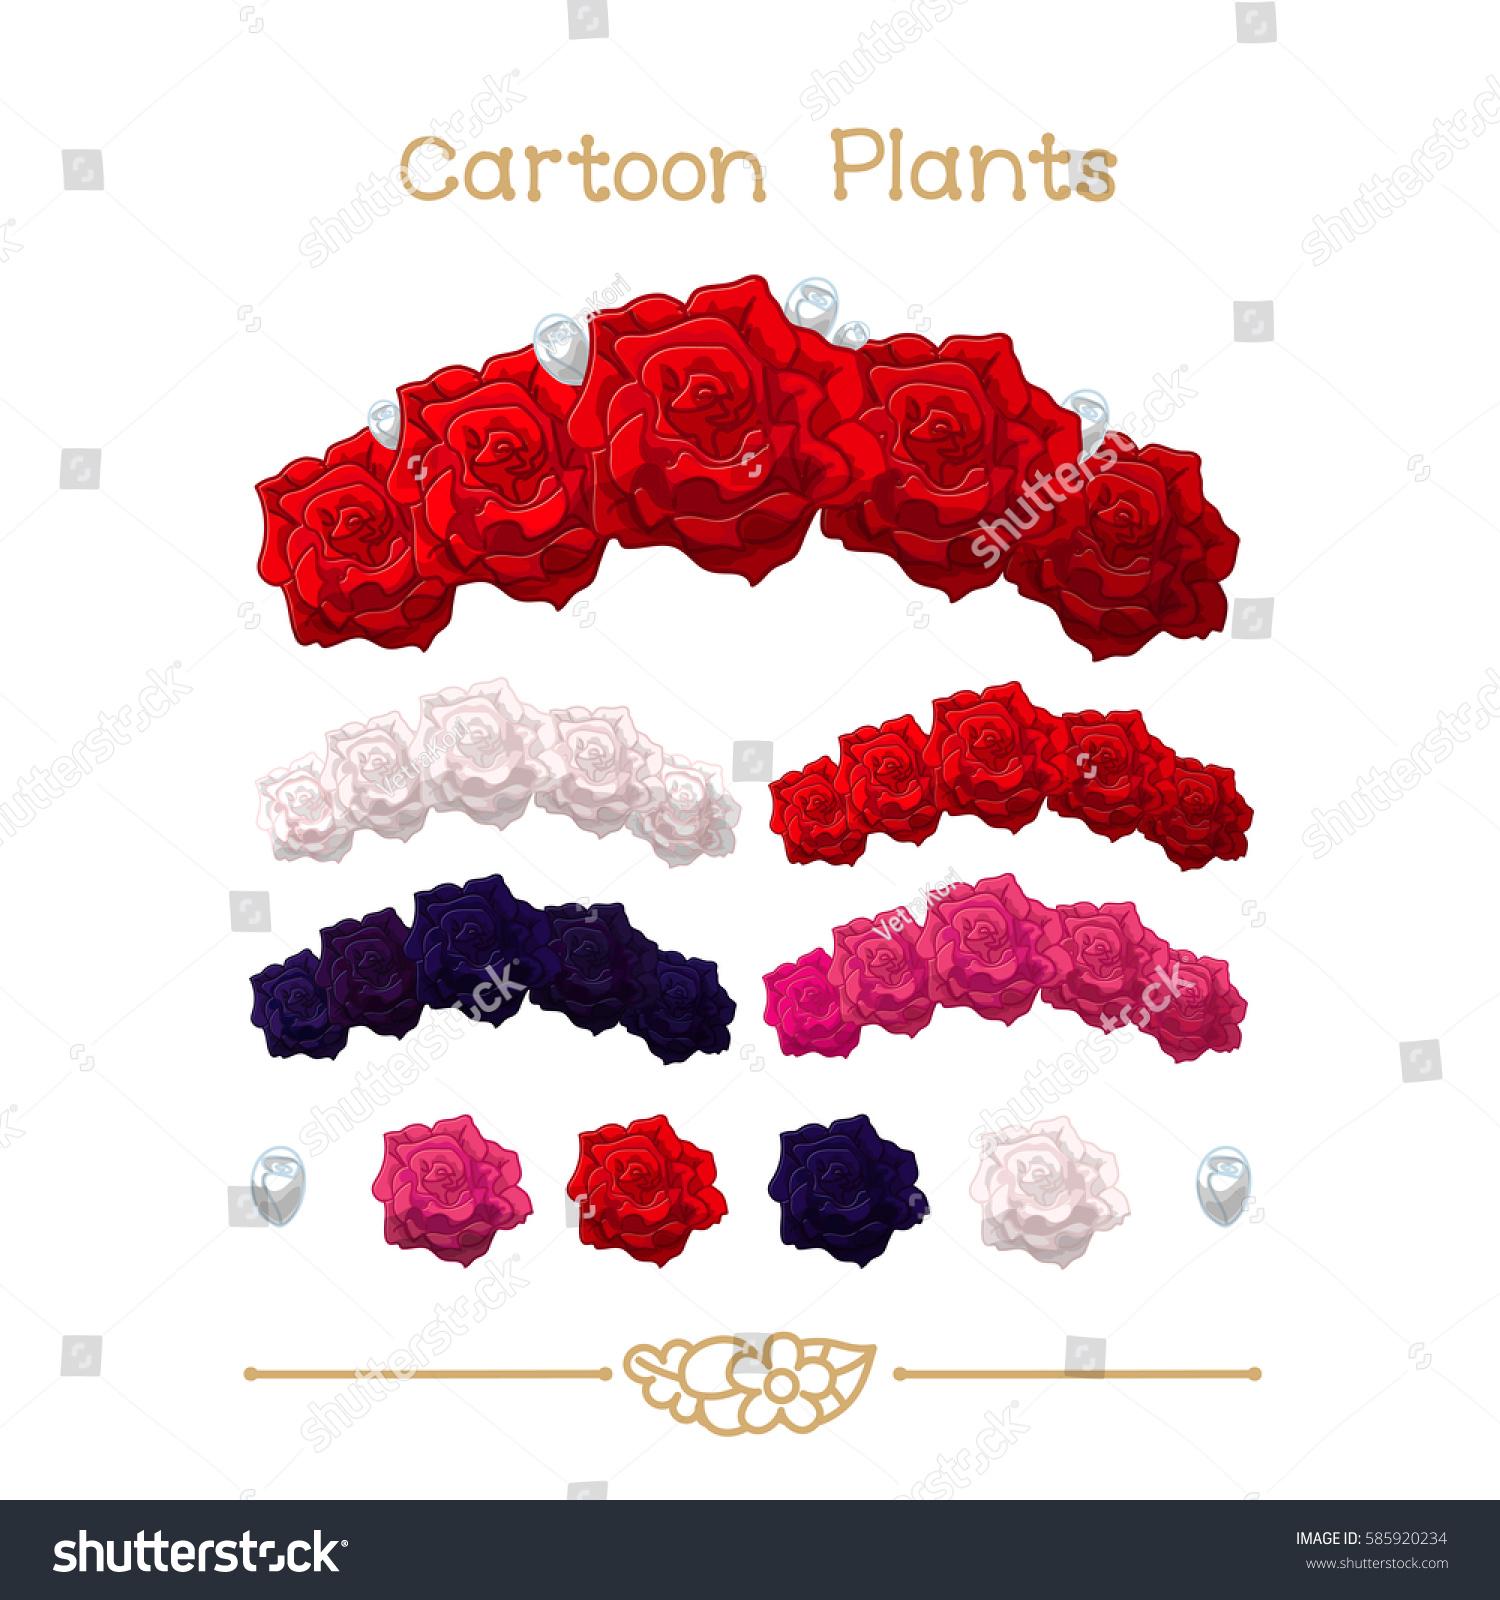 Vector pic series cartoon plants rose stock vector royalty free vector pic series cartoon plants rose flower crown set red pink white izmirmasajfo